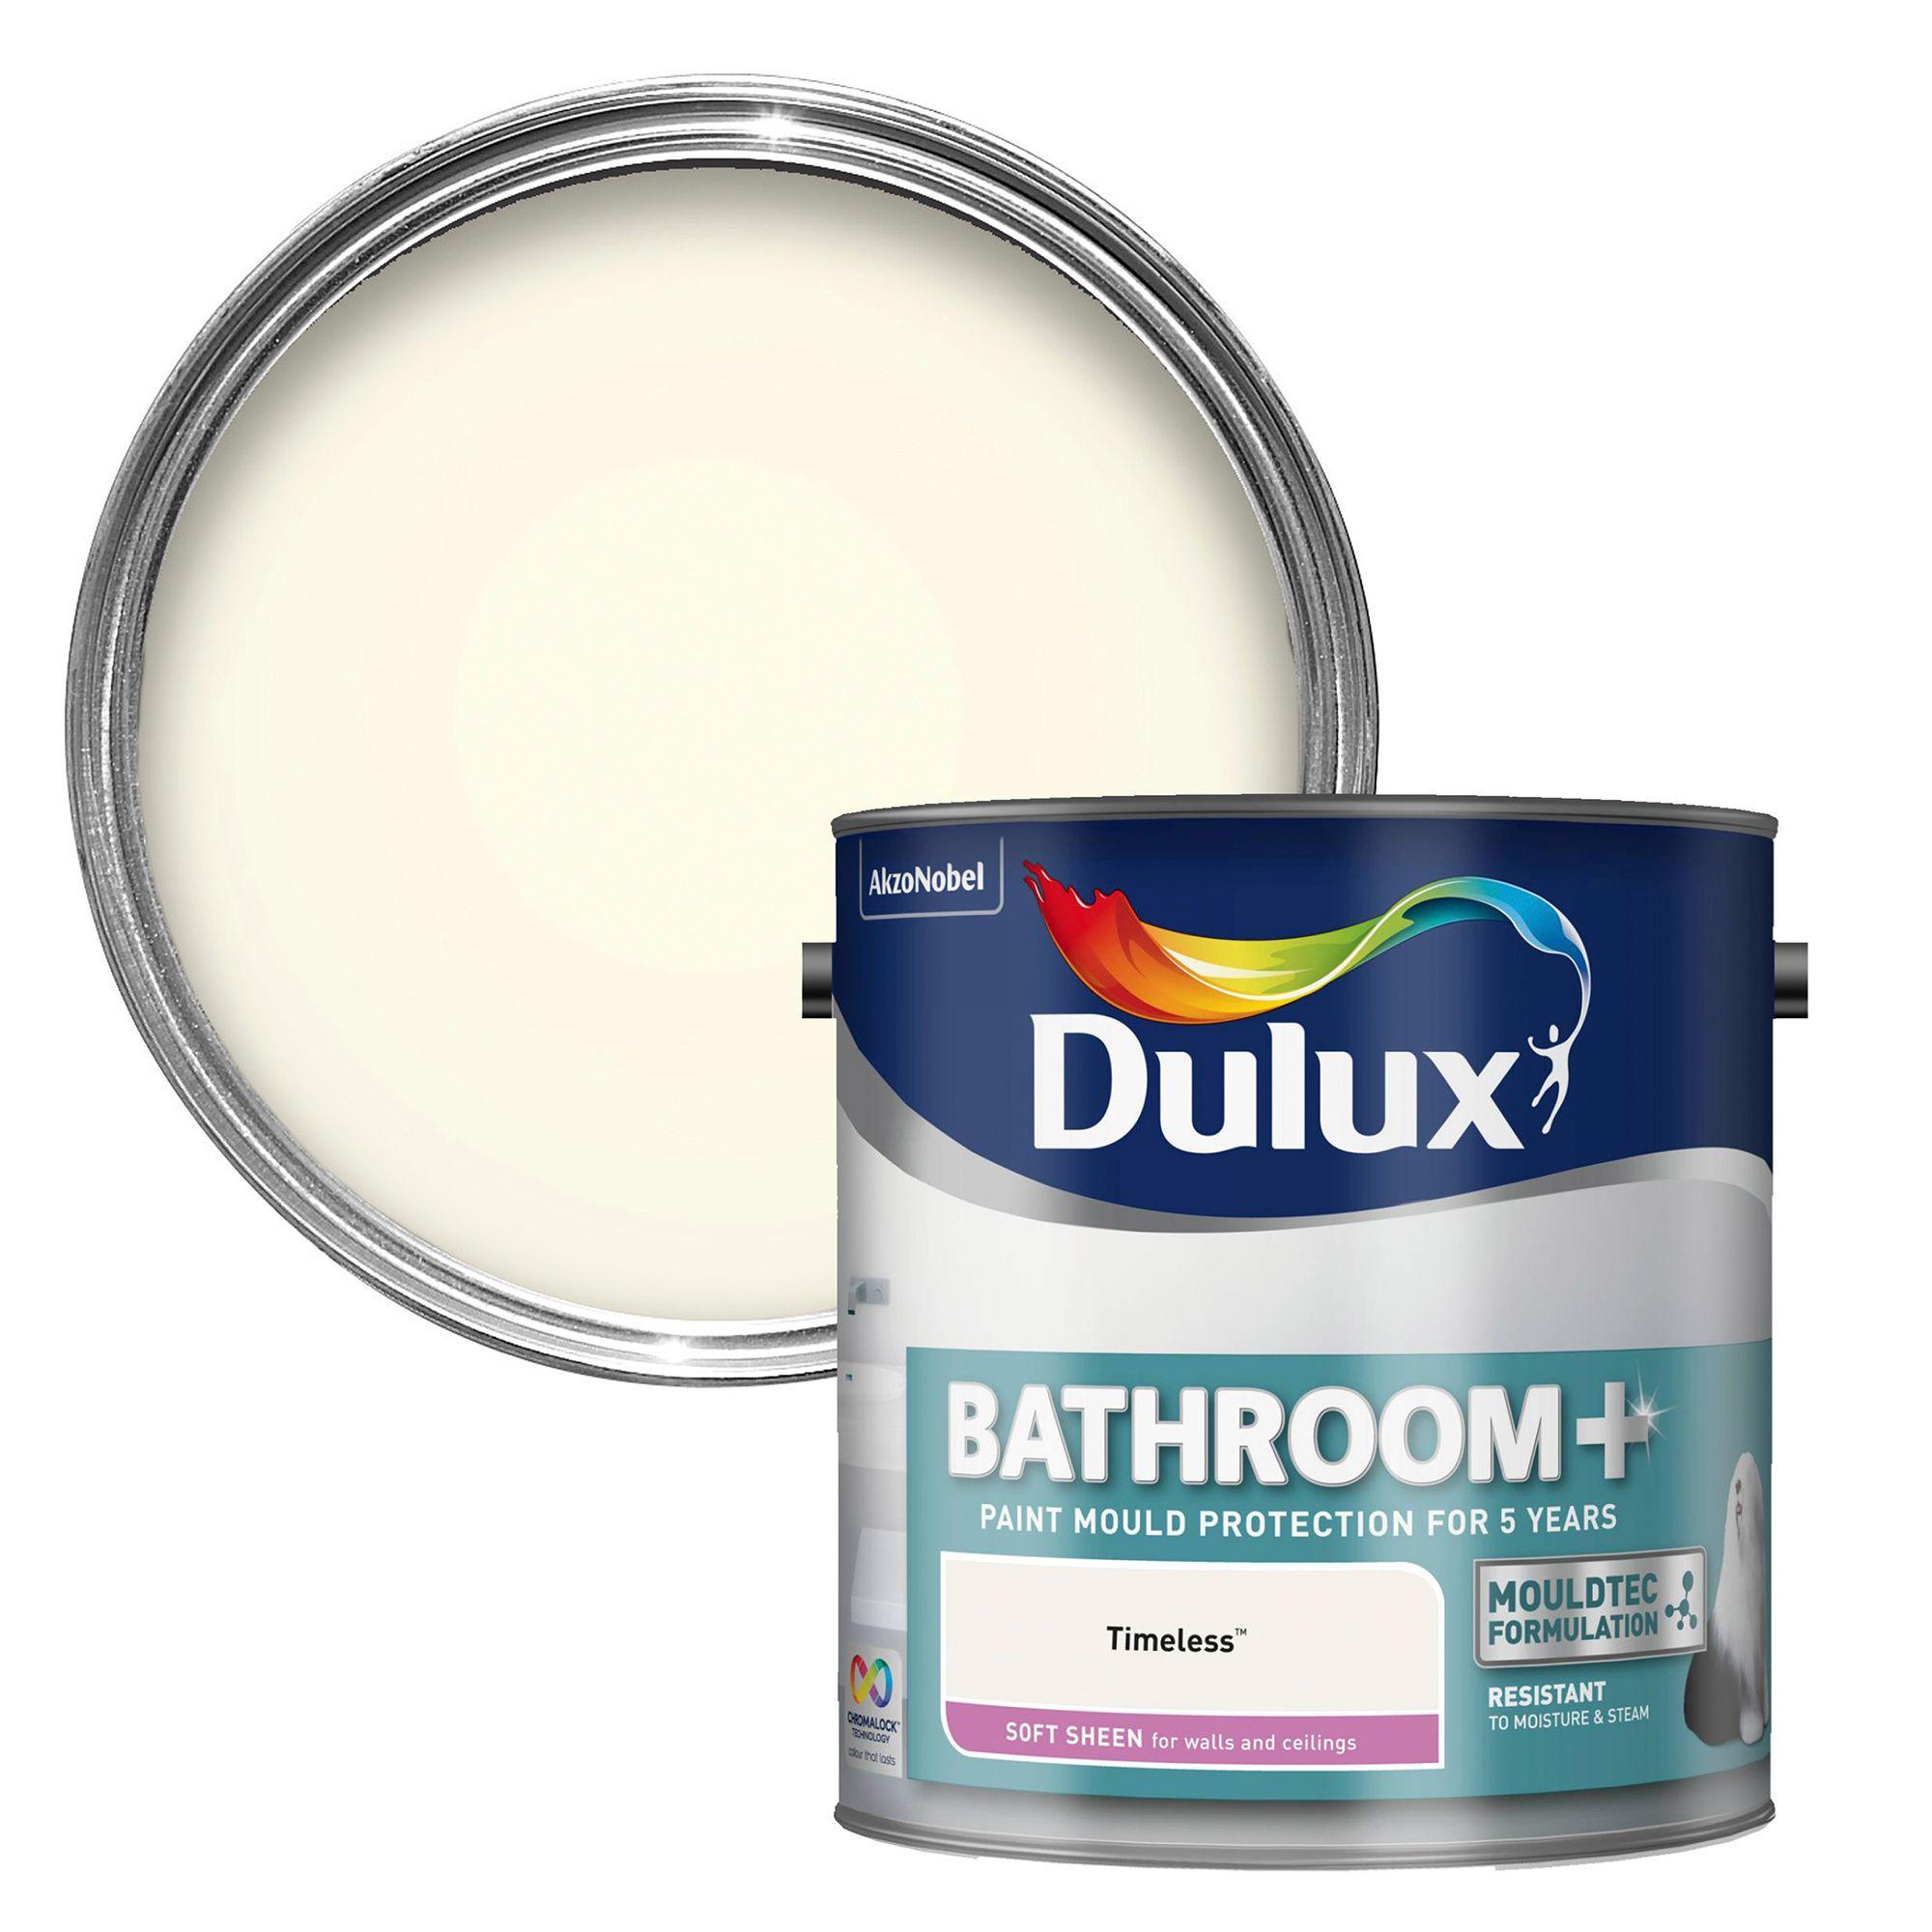 Dulux Bathroom+ Timeless Soft sheen Emulsion paint 2.5L ...